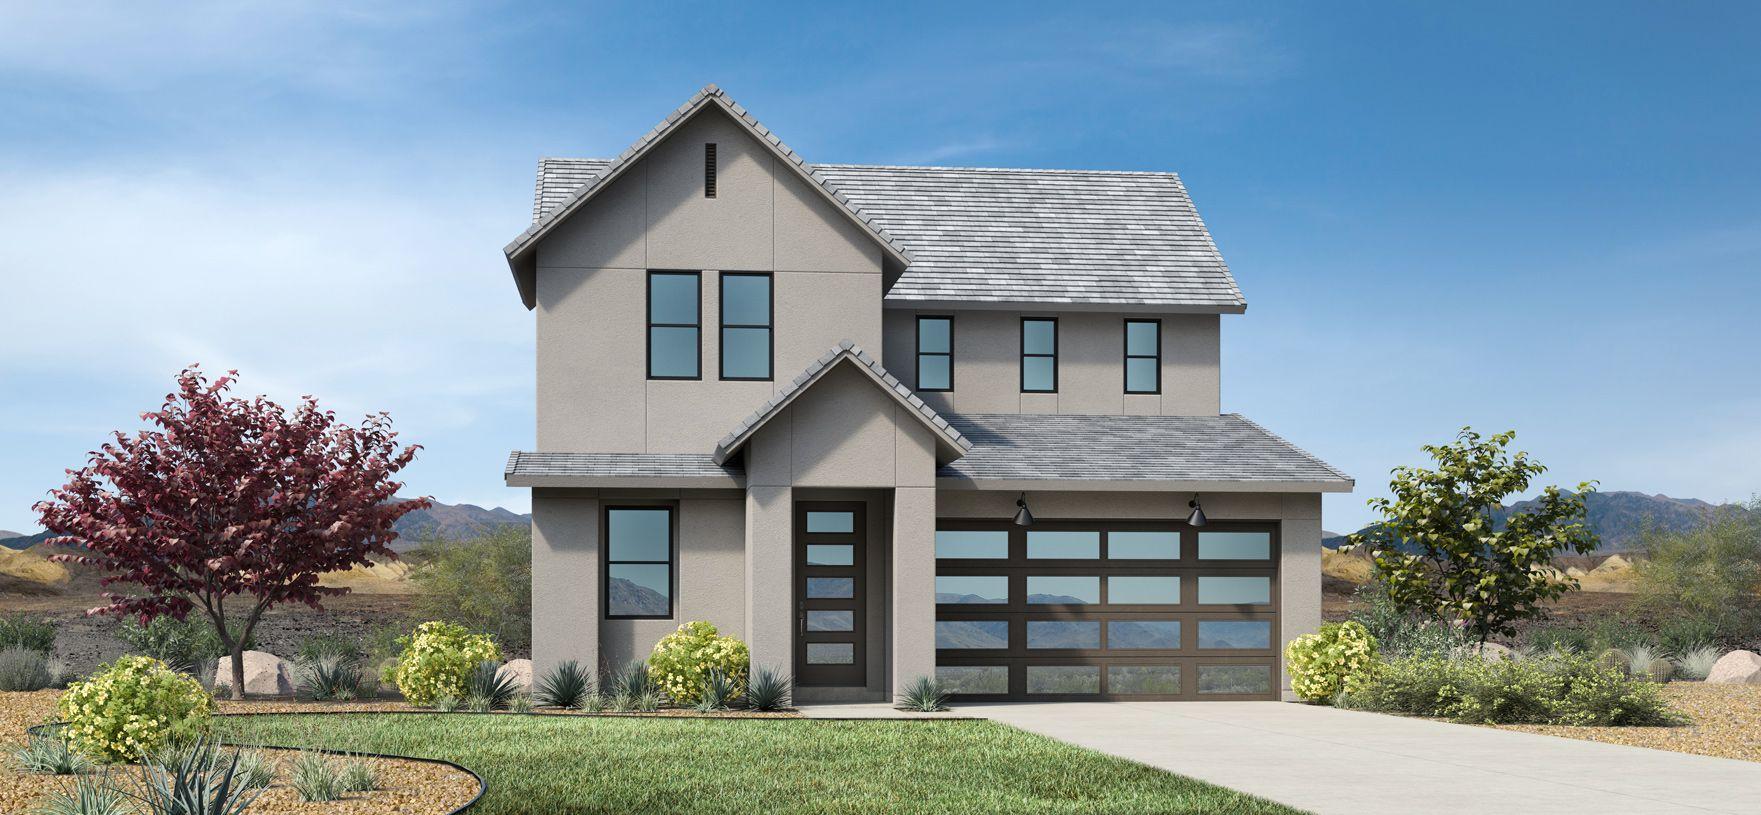 Elevation Image:Contemporary Farmhouse